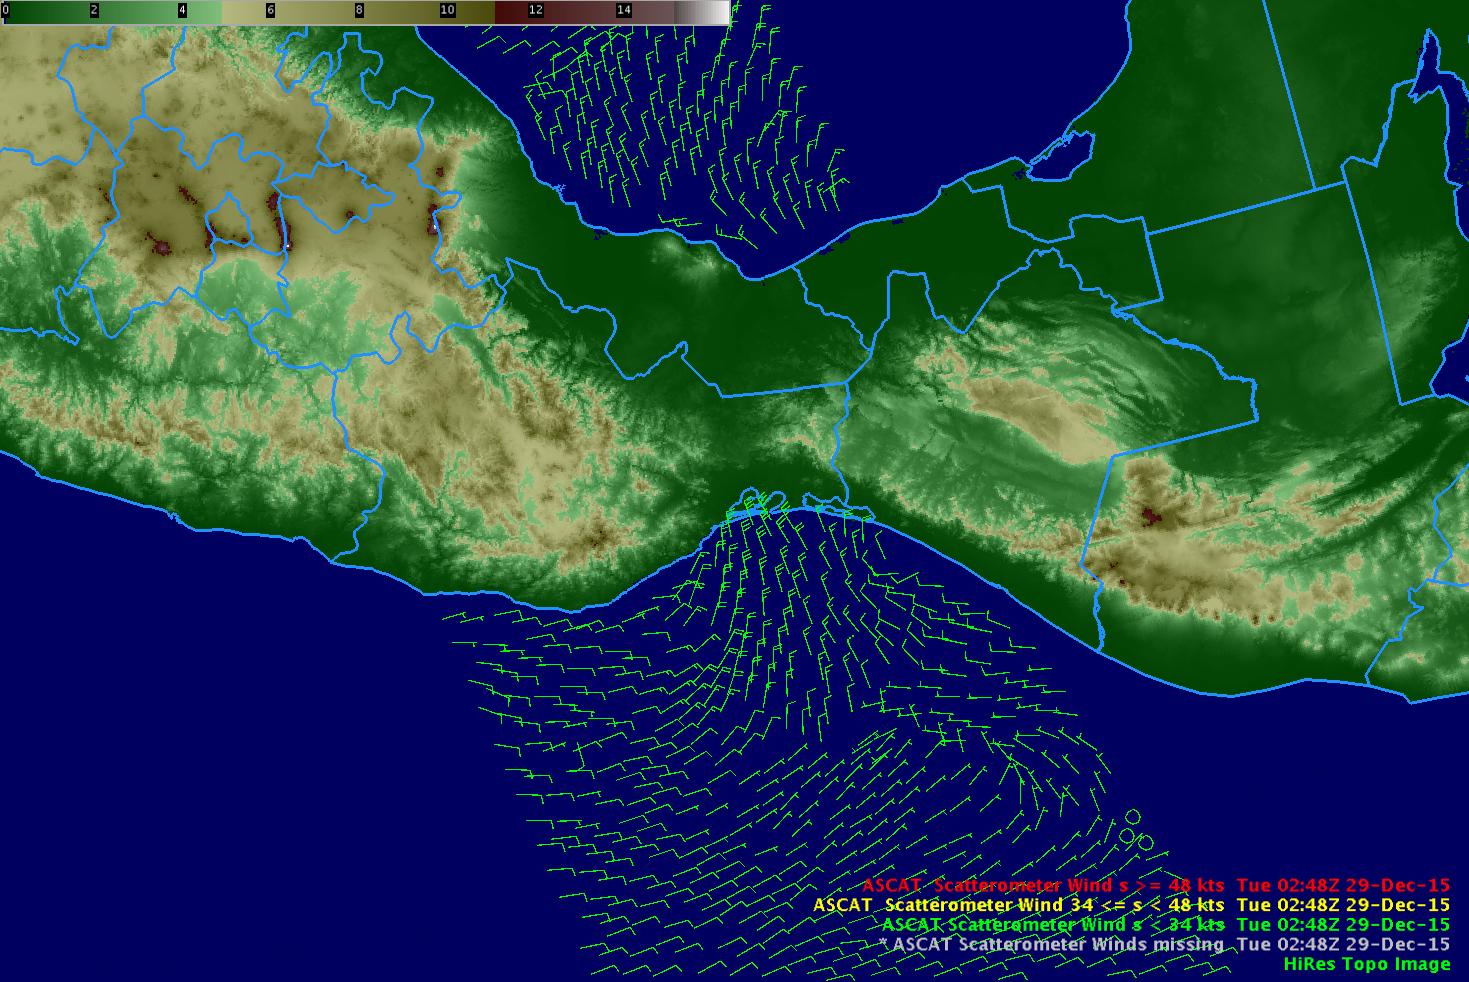 ASCAT Scatterometer Winds, 0248 UTC on 29 December, 2015 [click to enlarge]